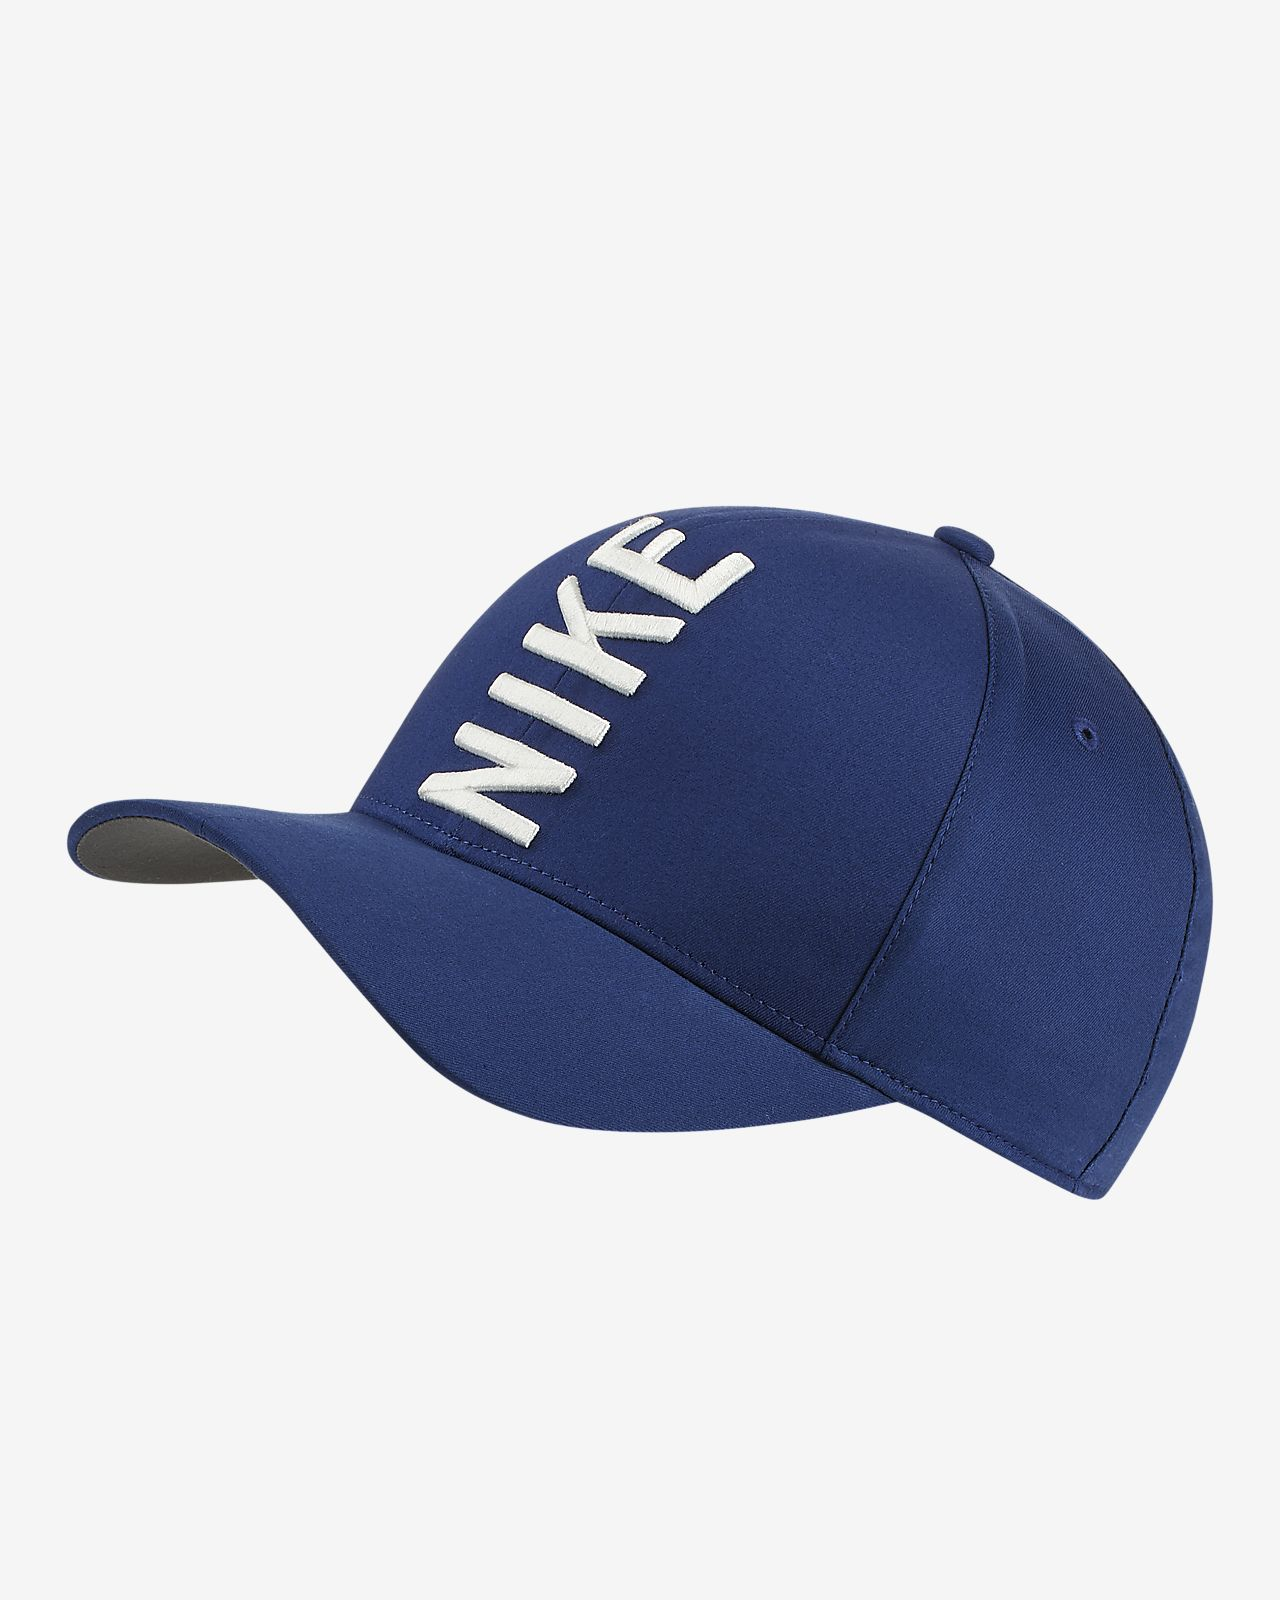 da89b6d0ca084 Nike AeroBill Classic99 Golf Hat. Nike.com